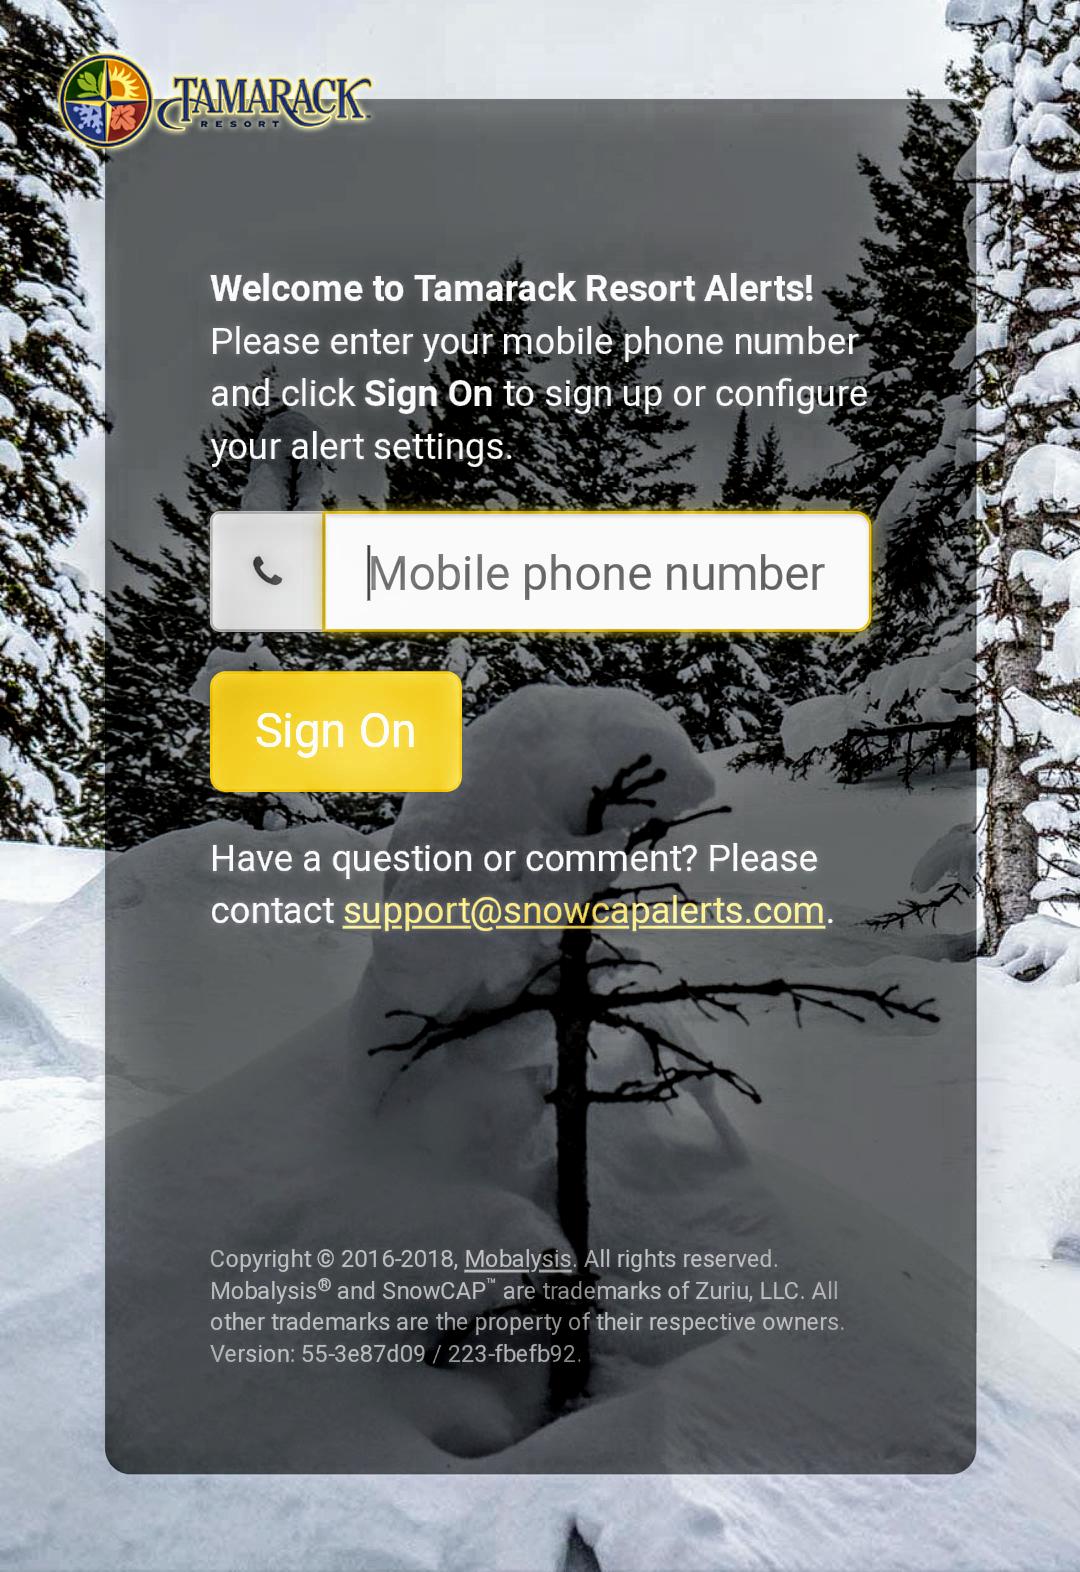 Tamarack Powder Alerts